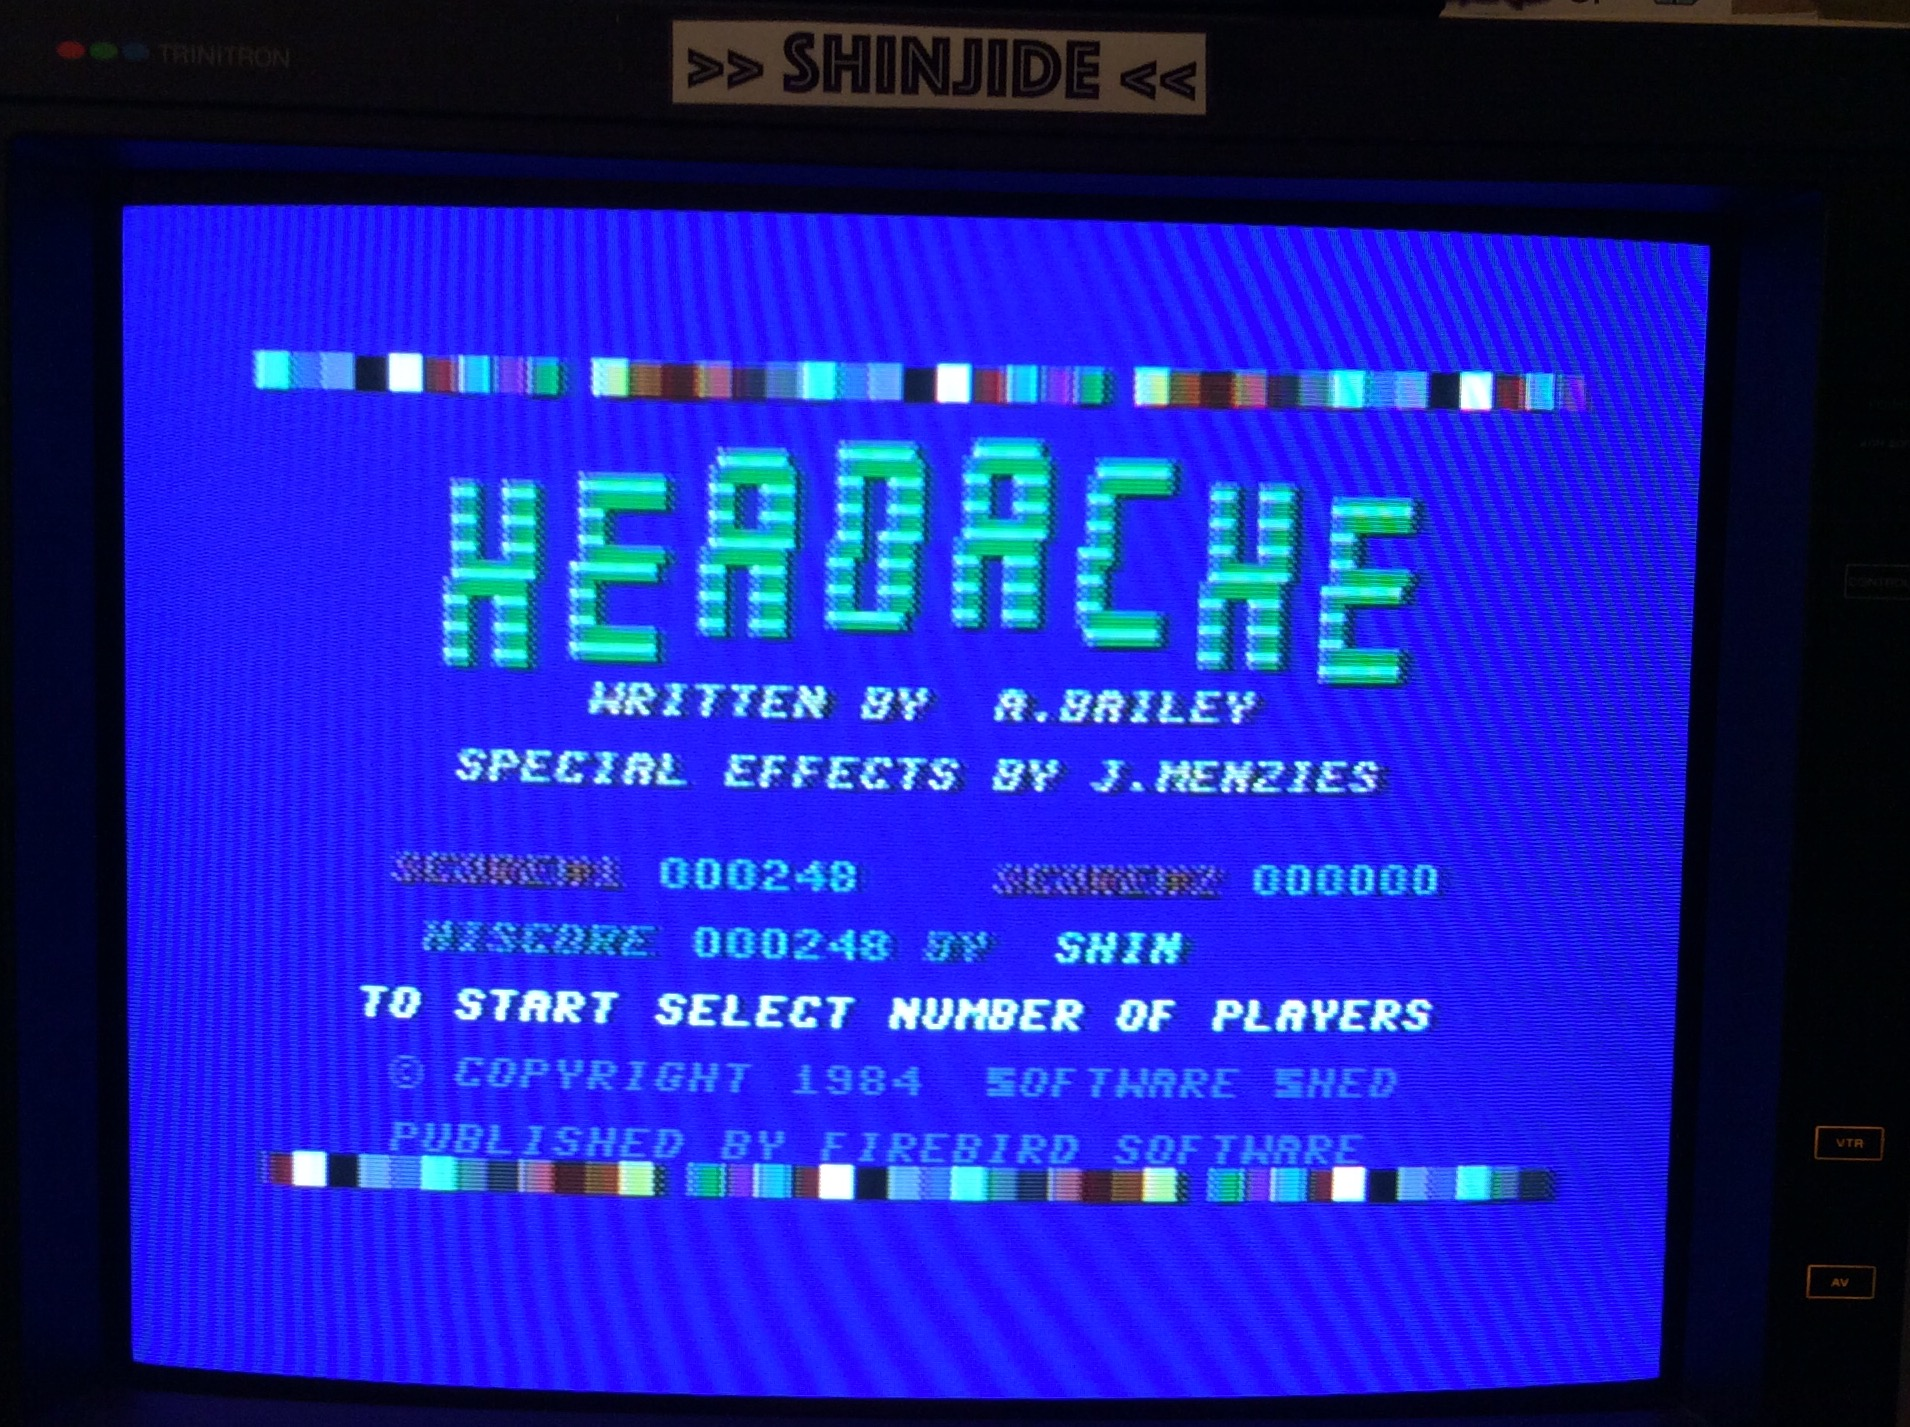 SHiNjide: Headache (Commodore 64) 248 points on 2015-11-29 11:19:29